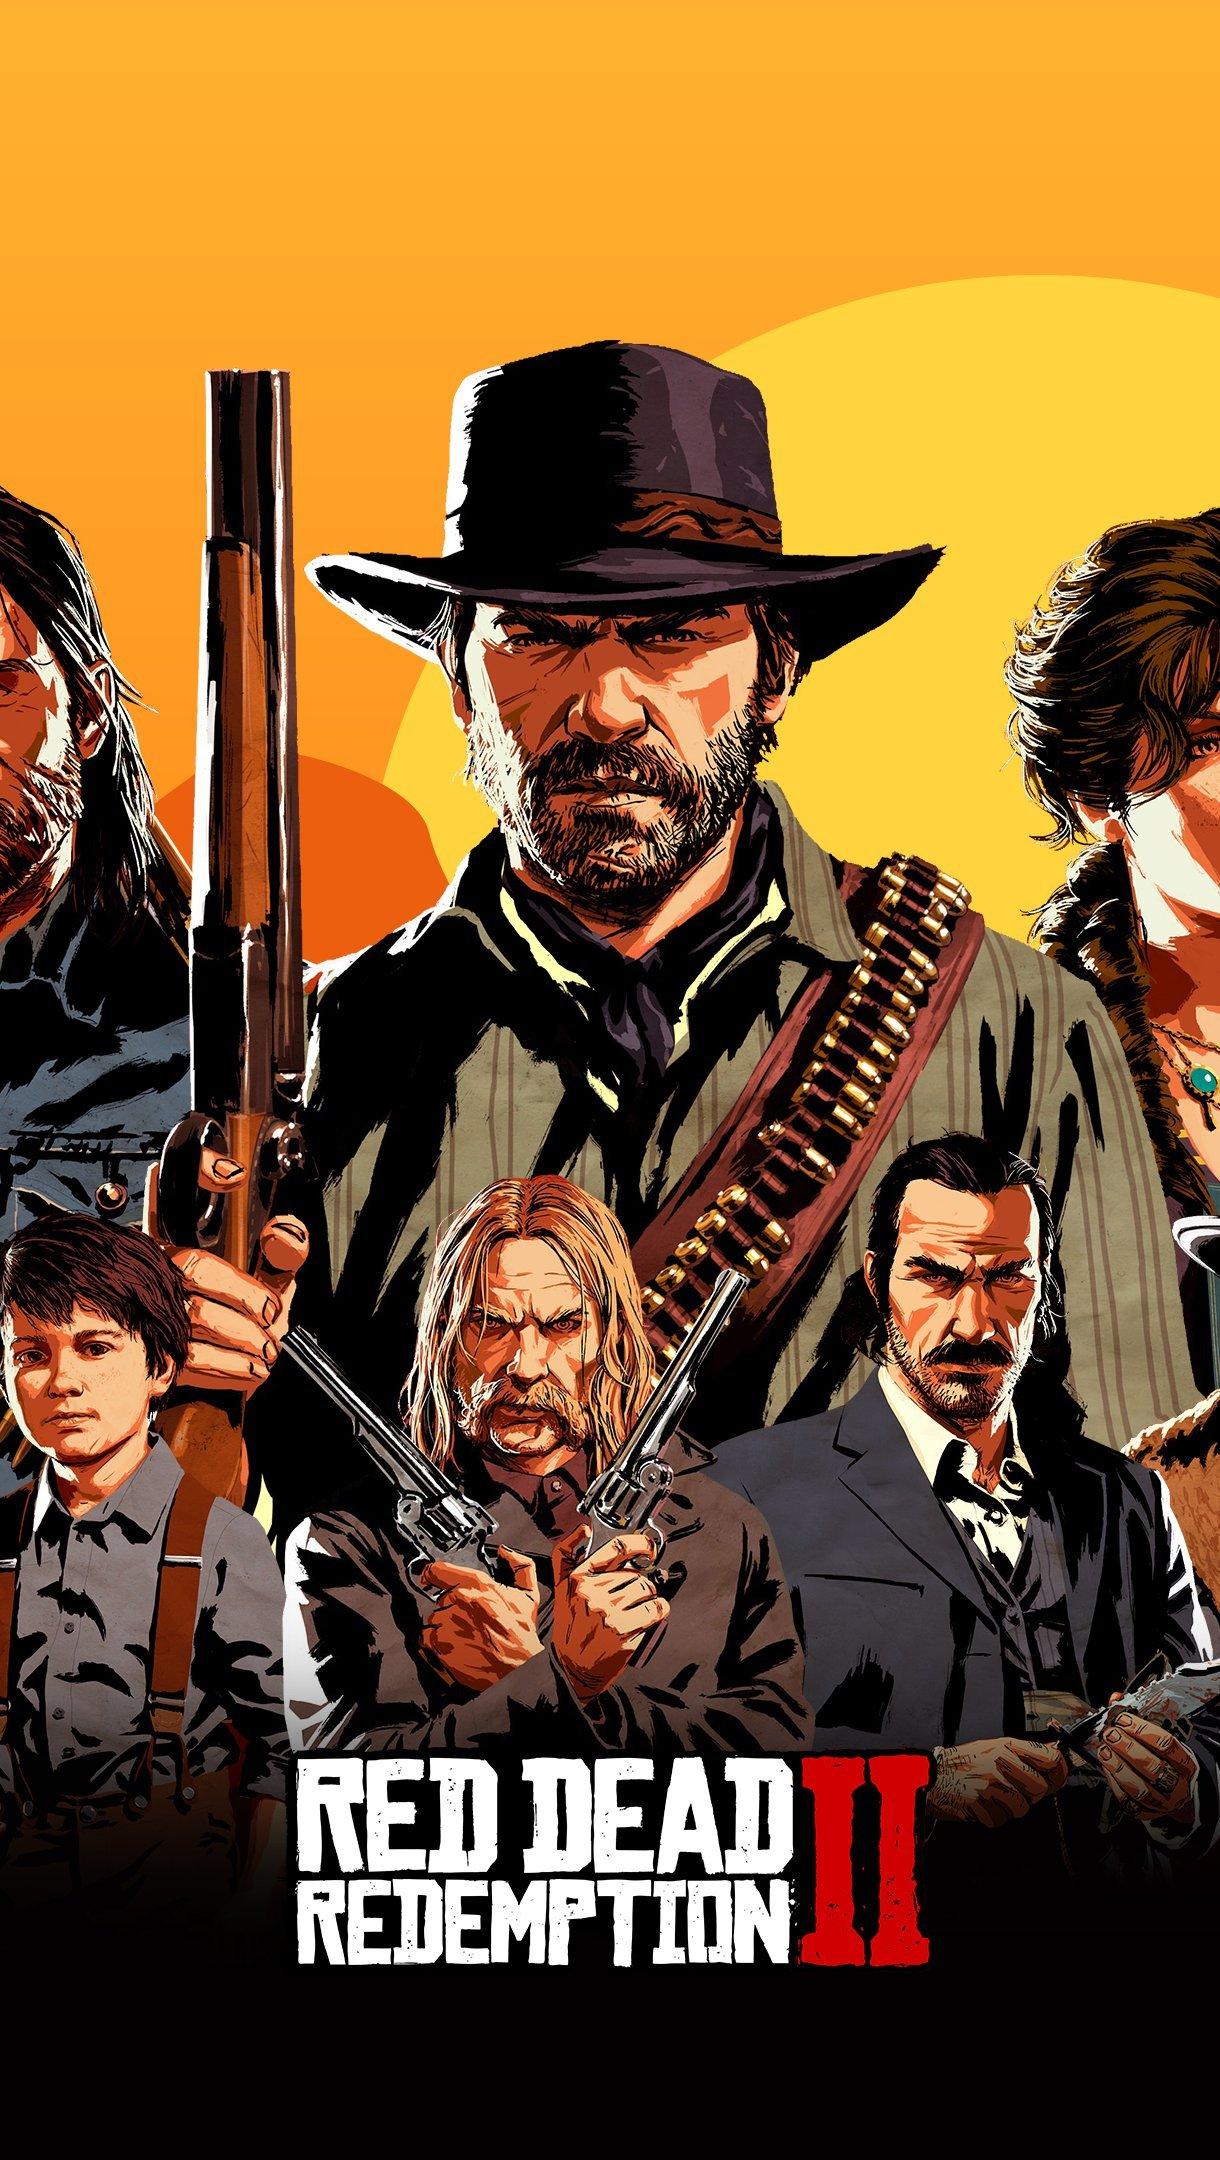 Fondos de pantalla Red Dead Redemption 2 Cover Personajes Vertical